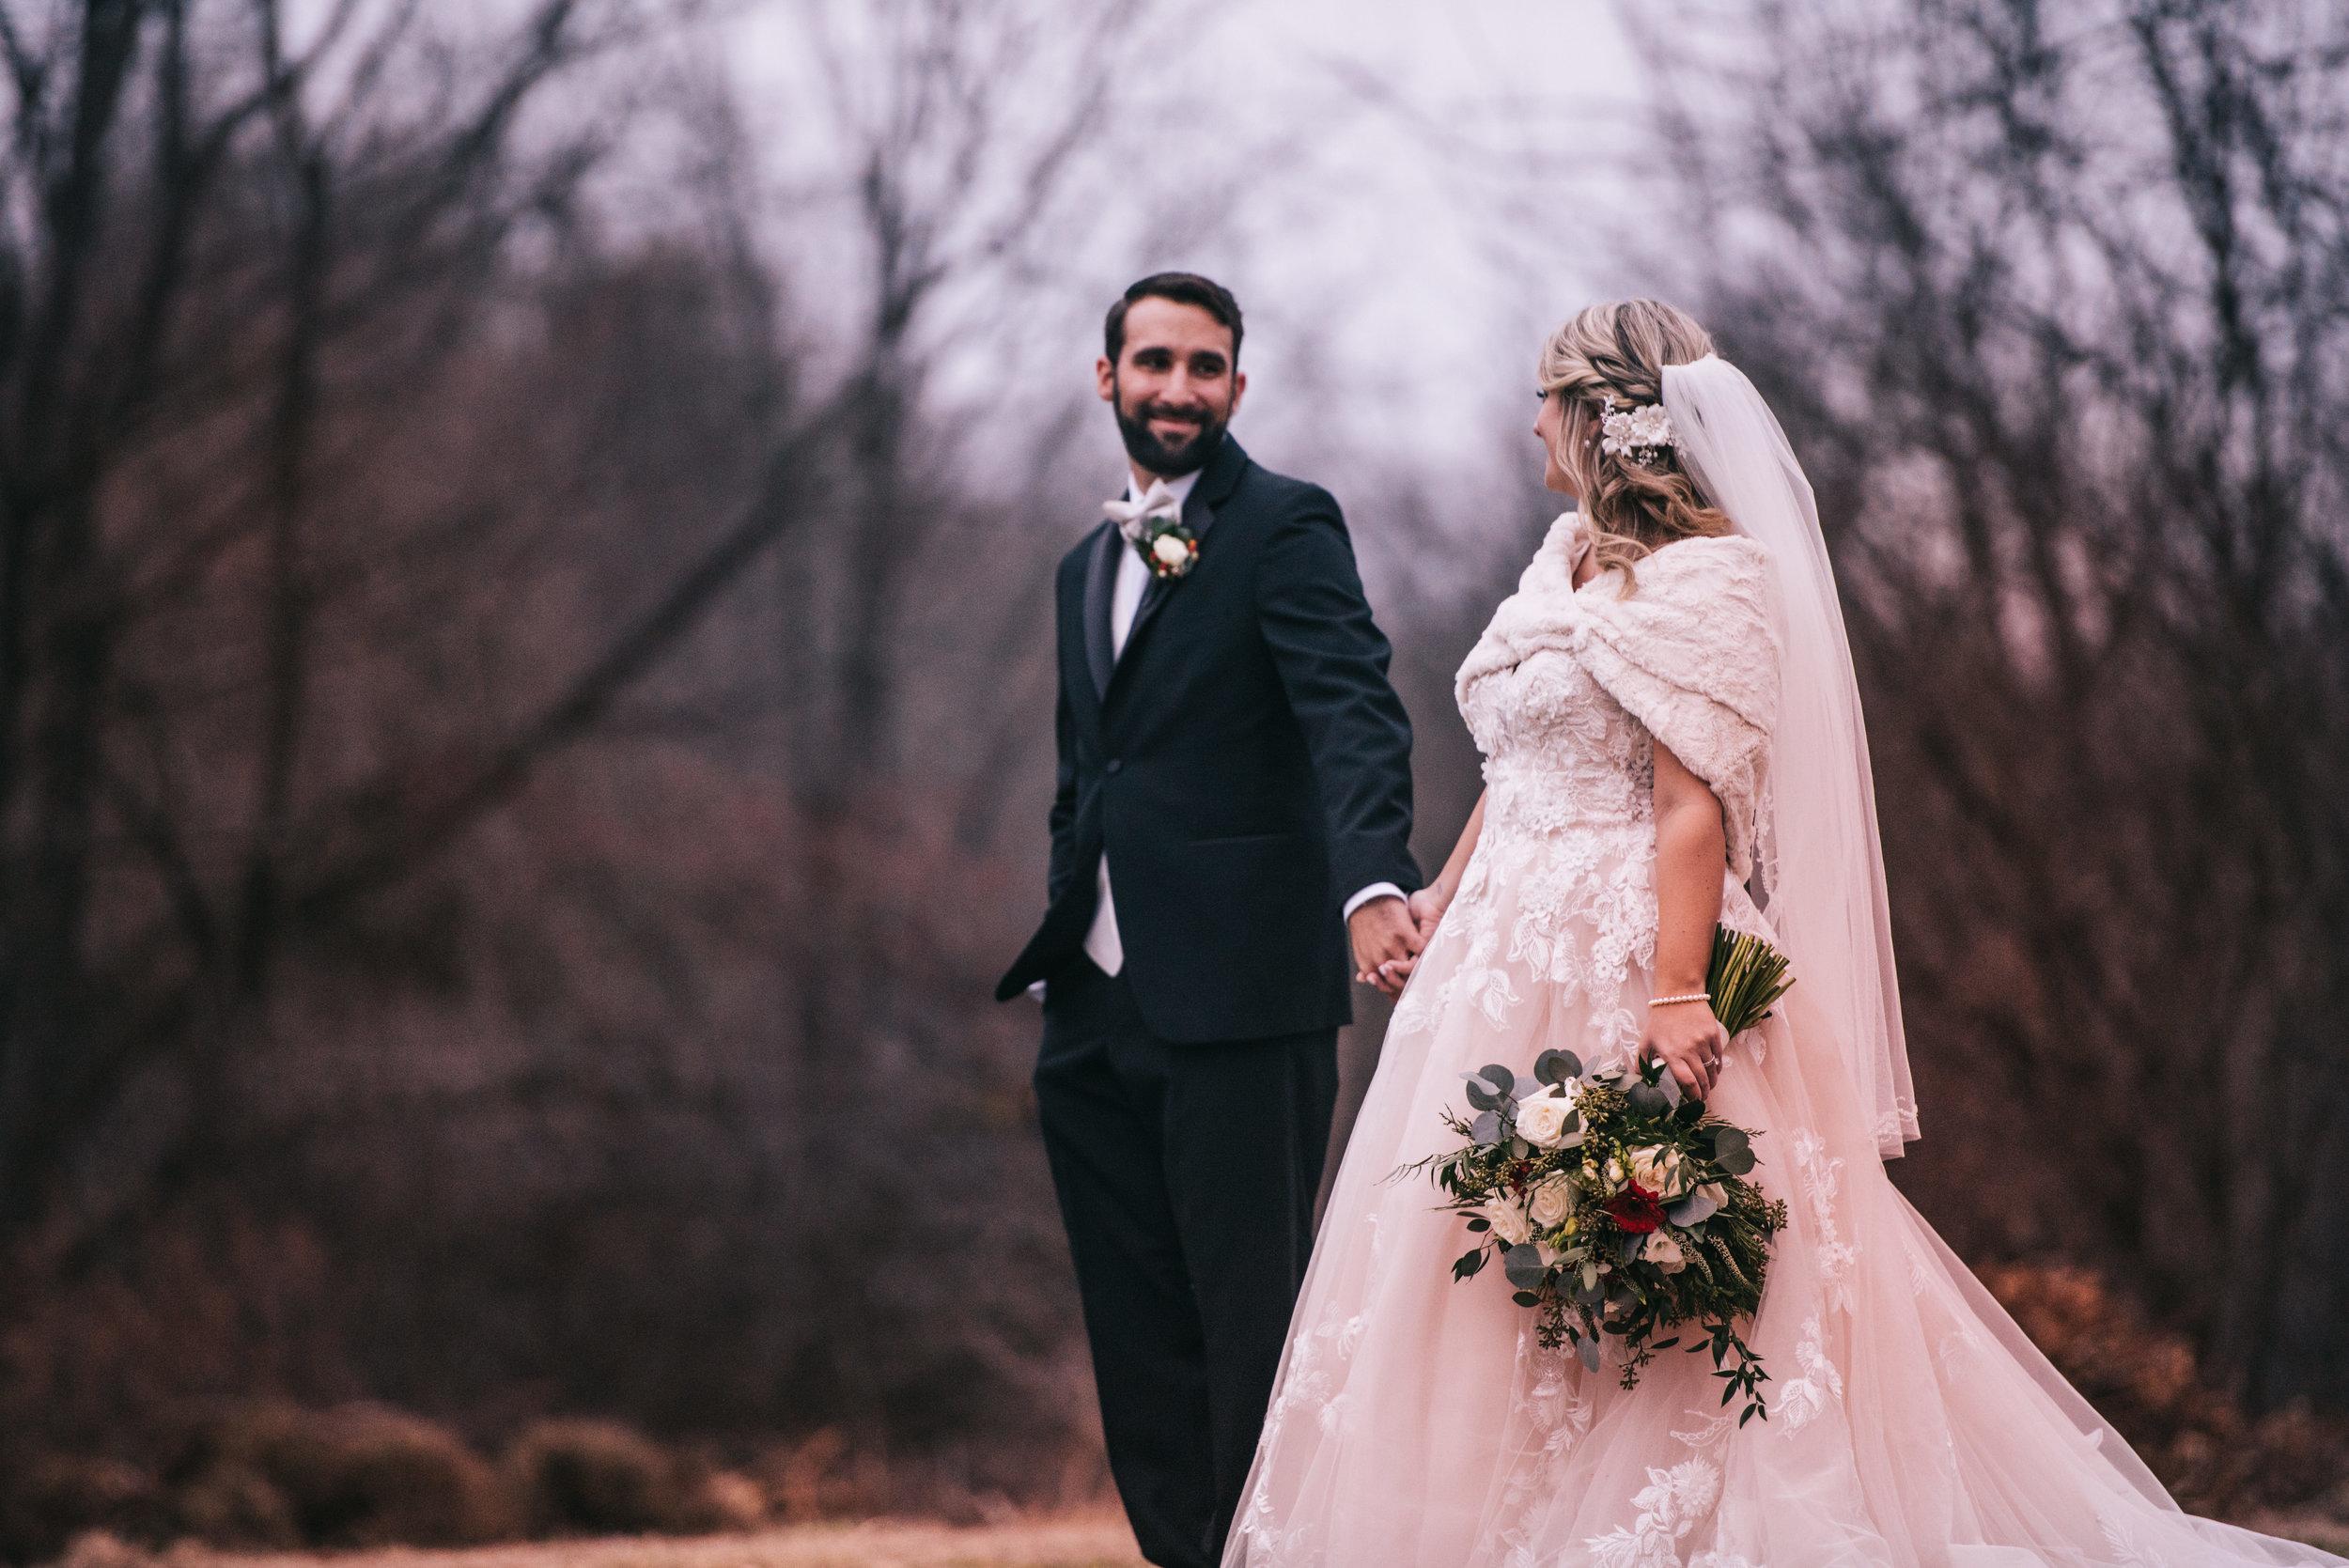 WeddingPhotos | NJPhotographer | Highlights-14-15.jpg